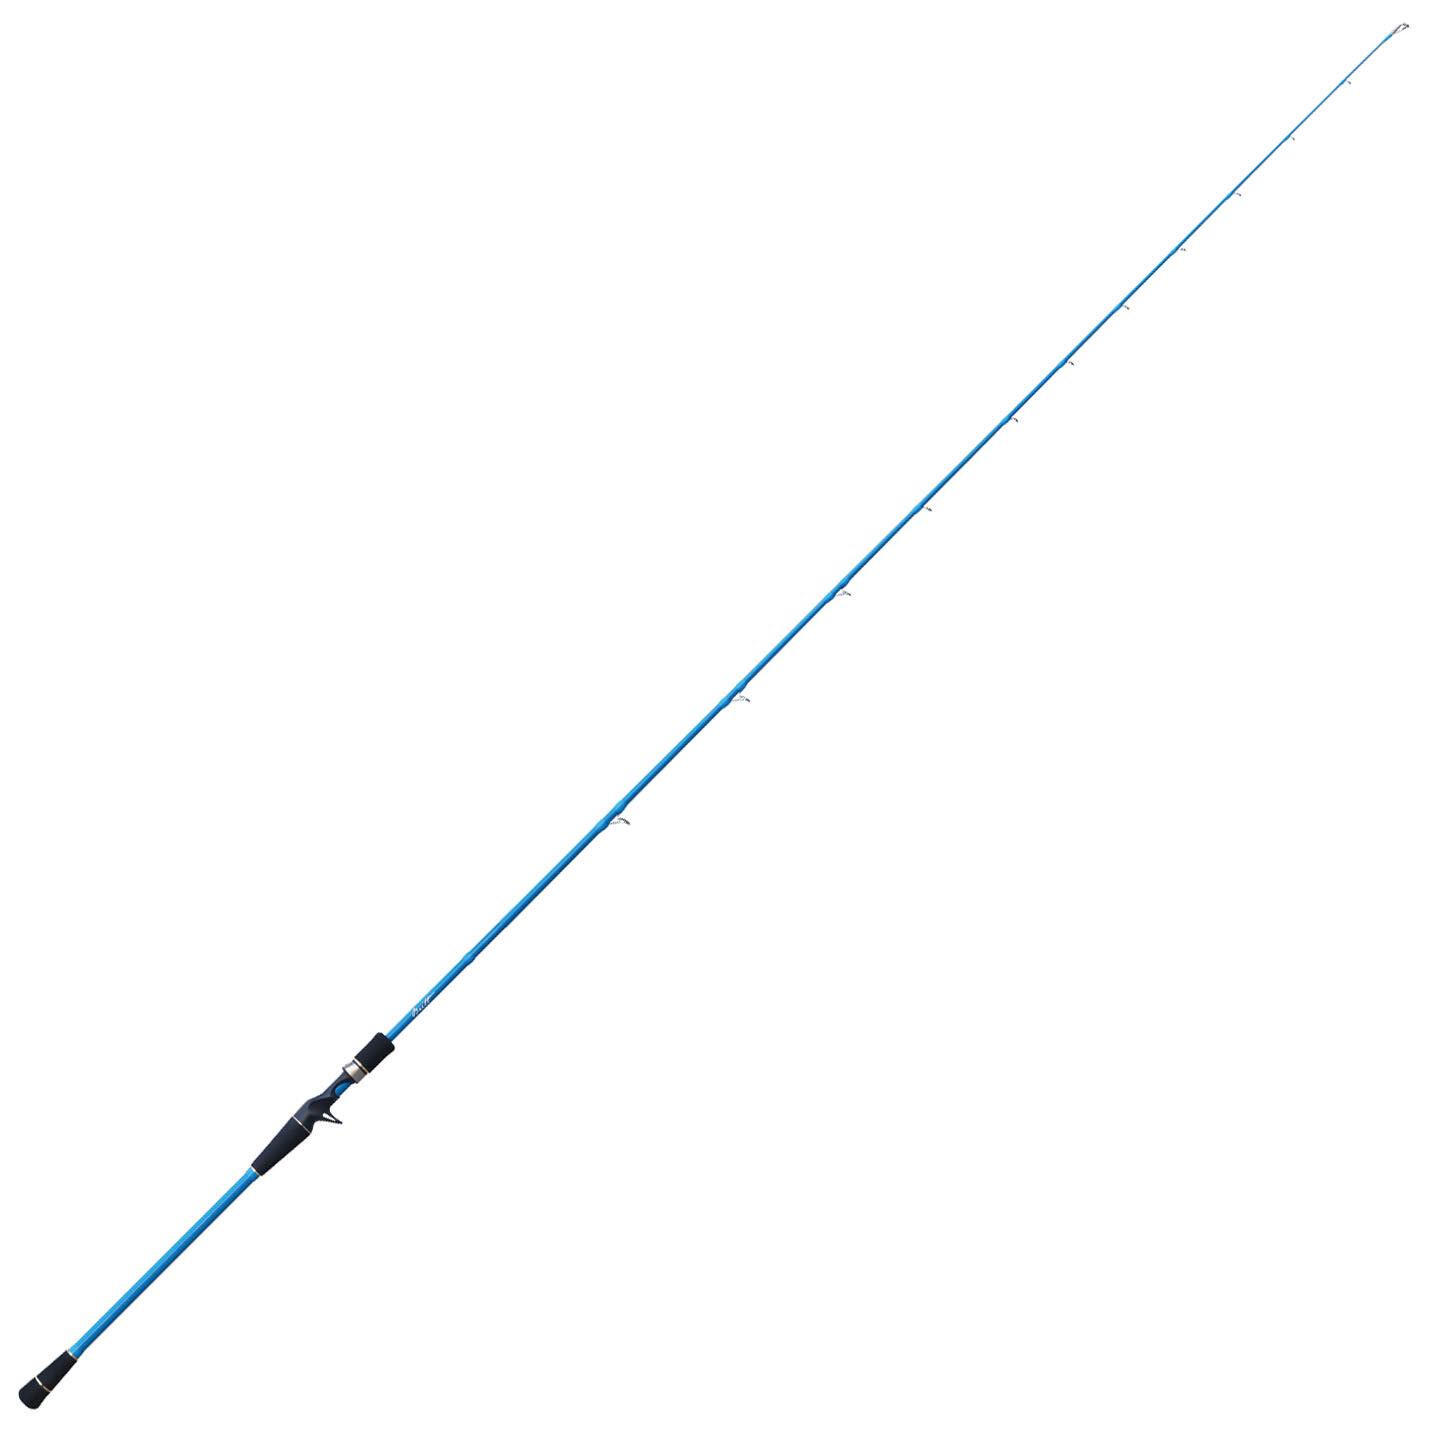 D0900360 Canna Pesca Jigging Slow Pitch Falcon Britt 6'8 80200 gr  CAS